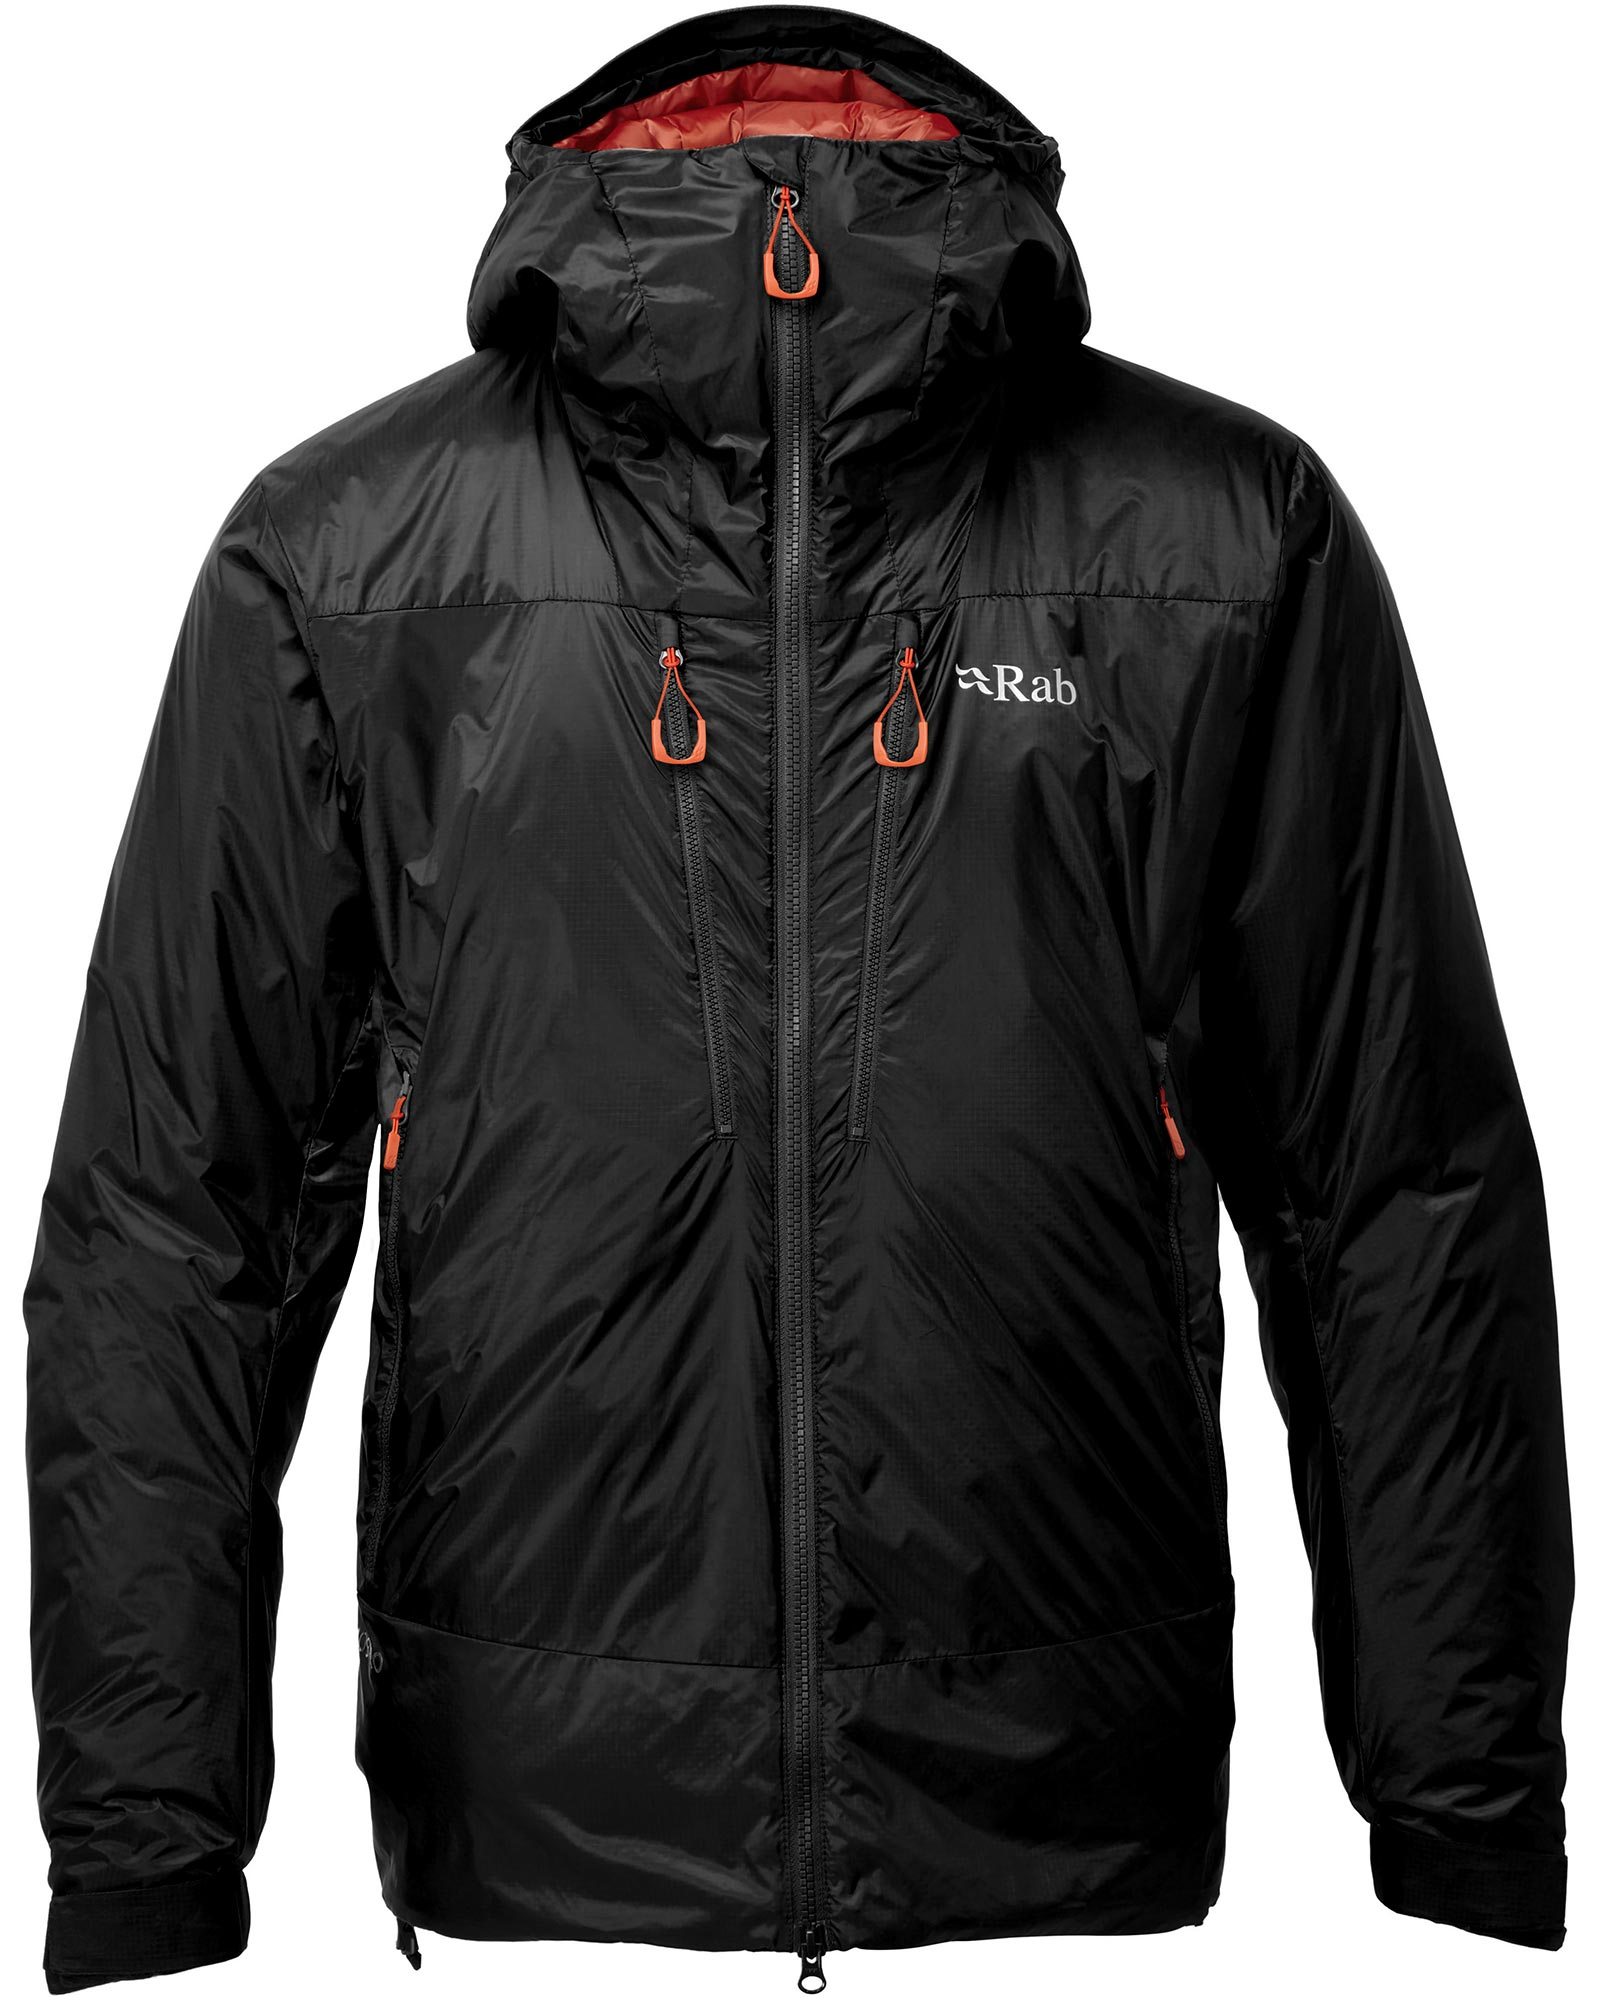 Rab Photon Pro Men's Jacket 0